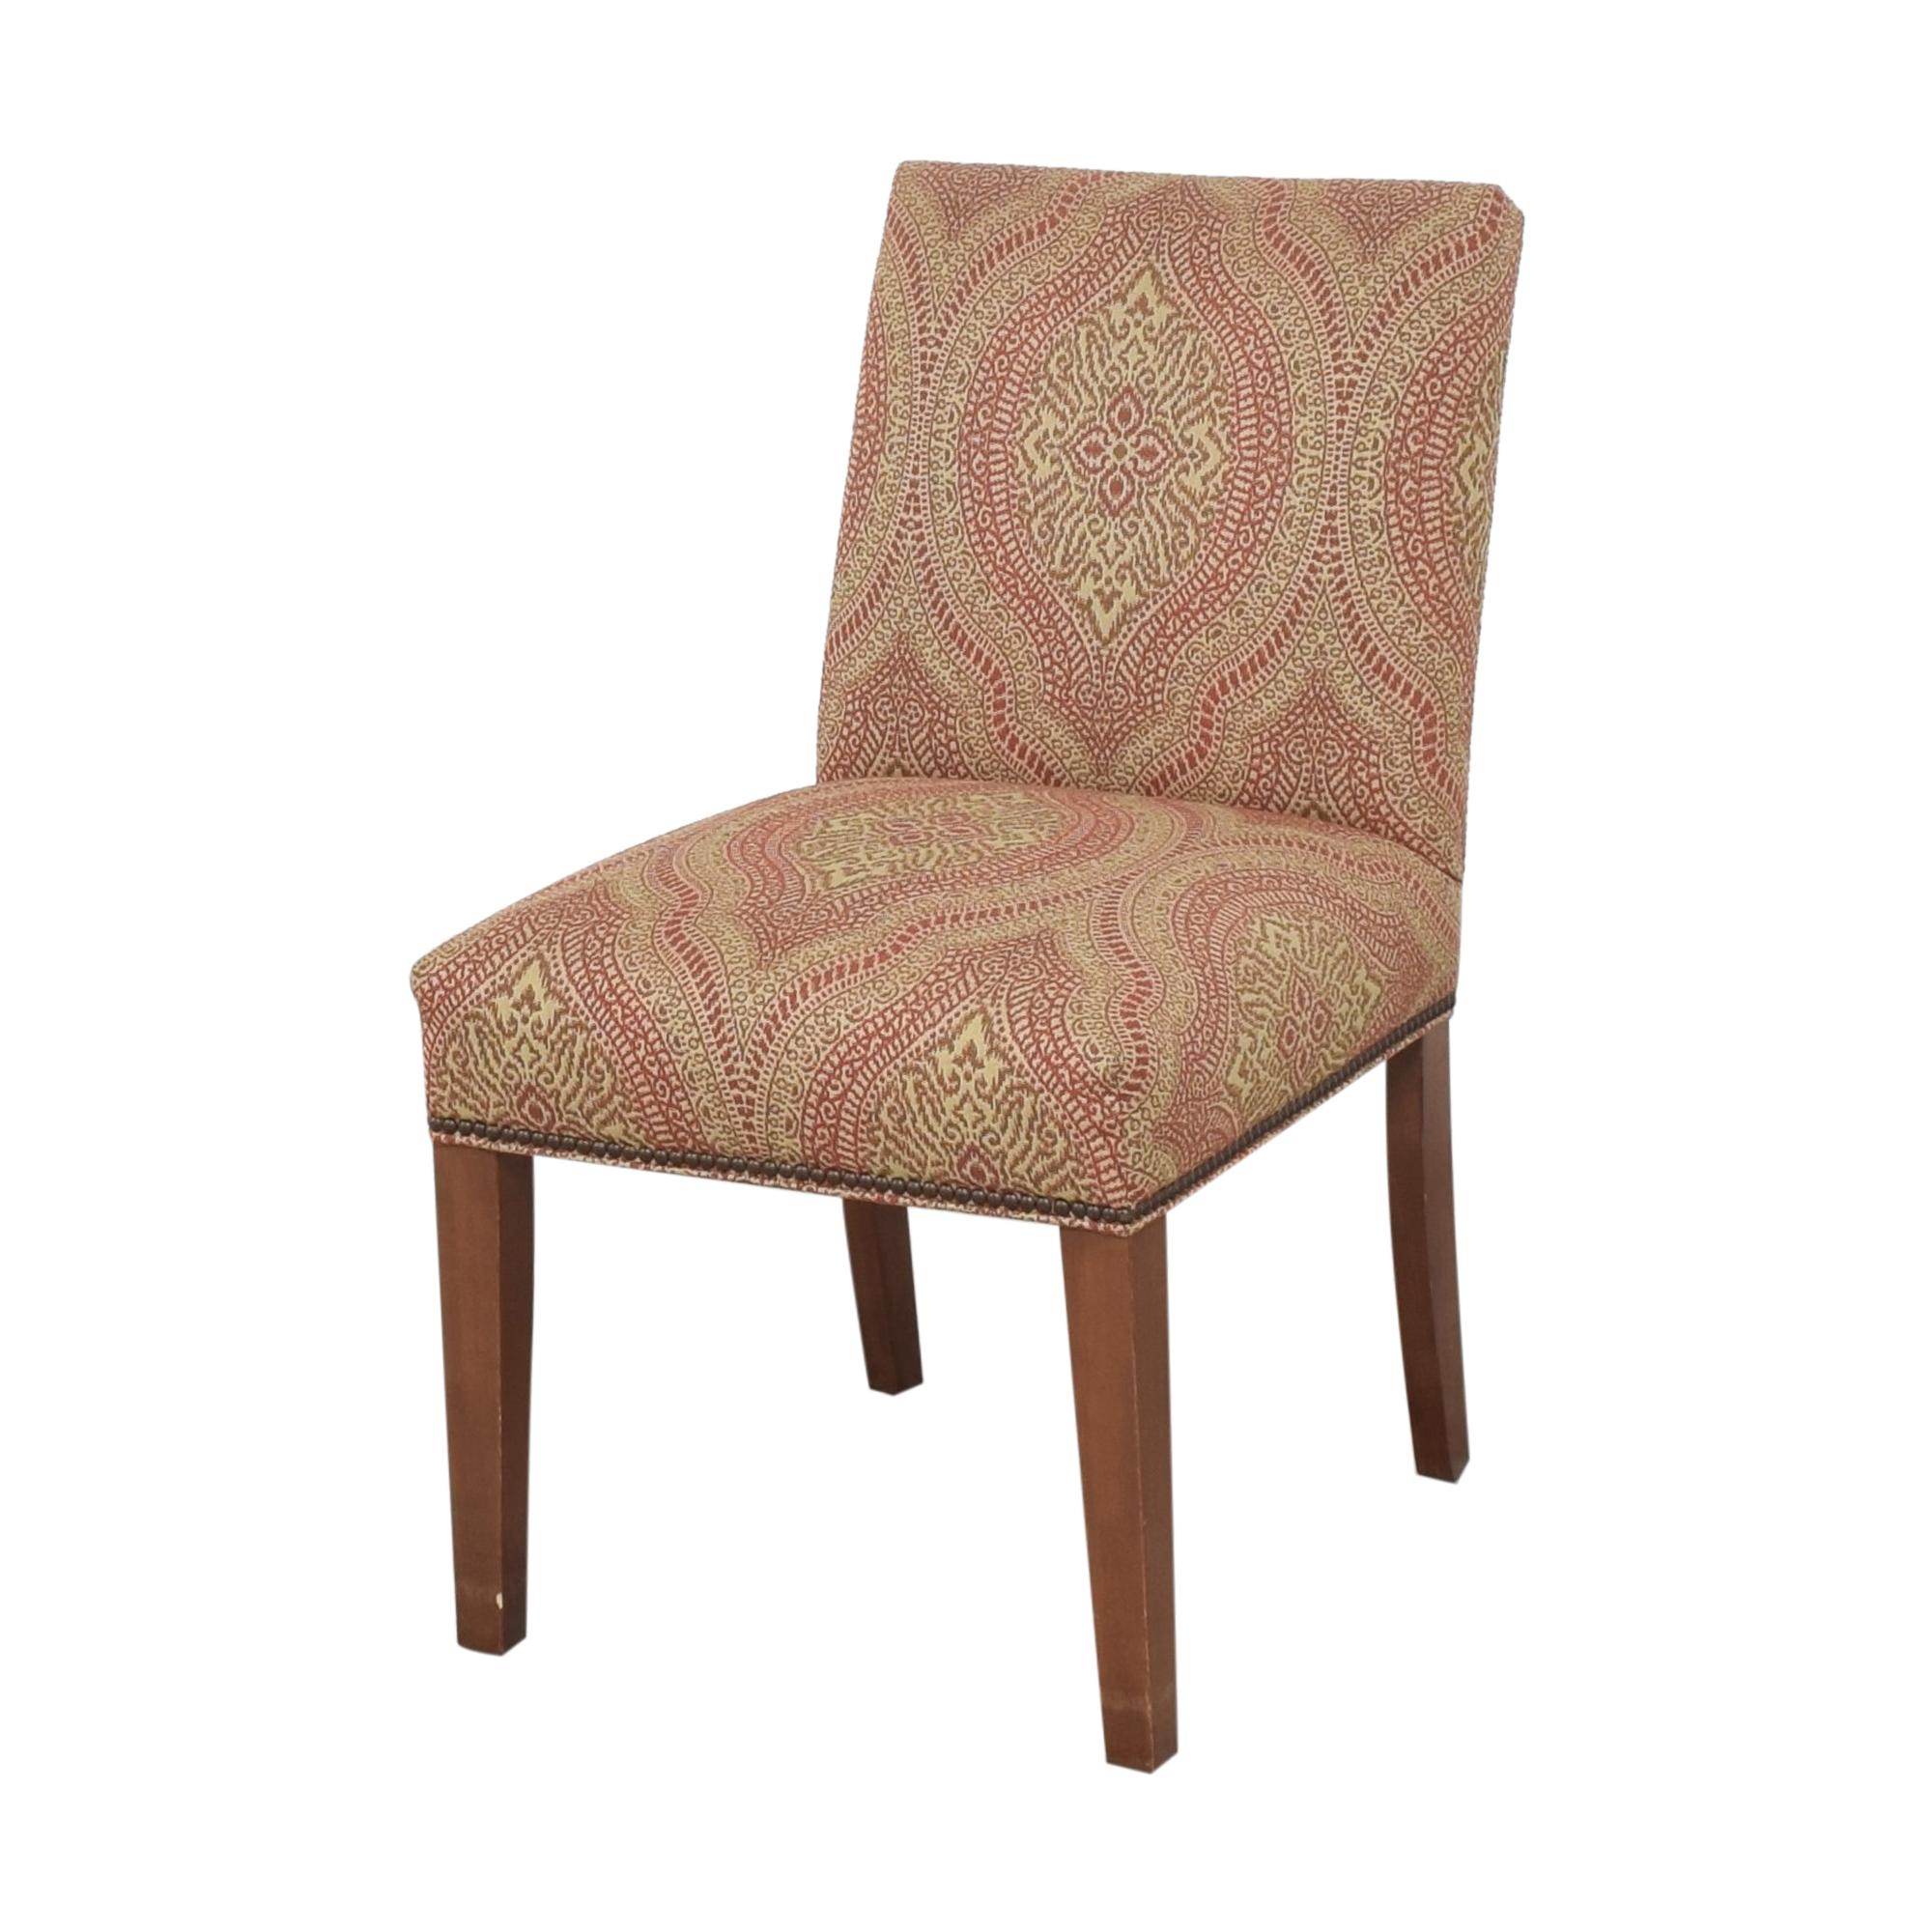 shop Ethan Allen Sebago Dining Chairs Ethan Allen Chairs